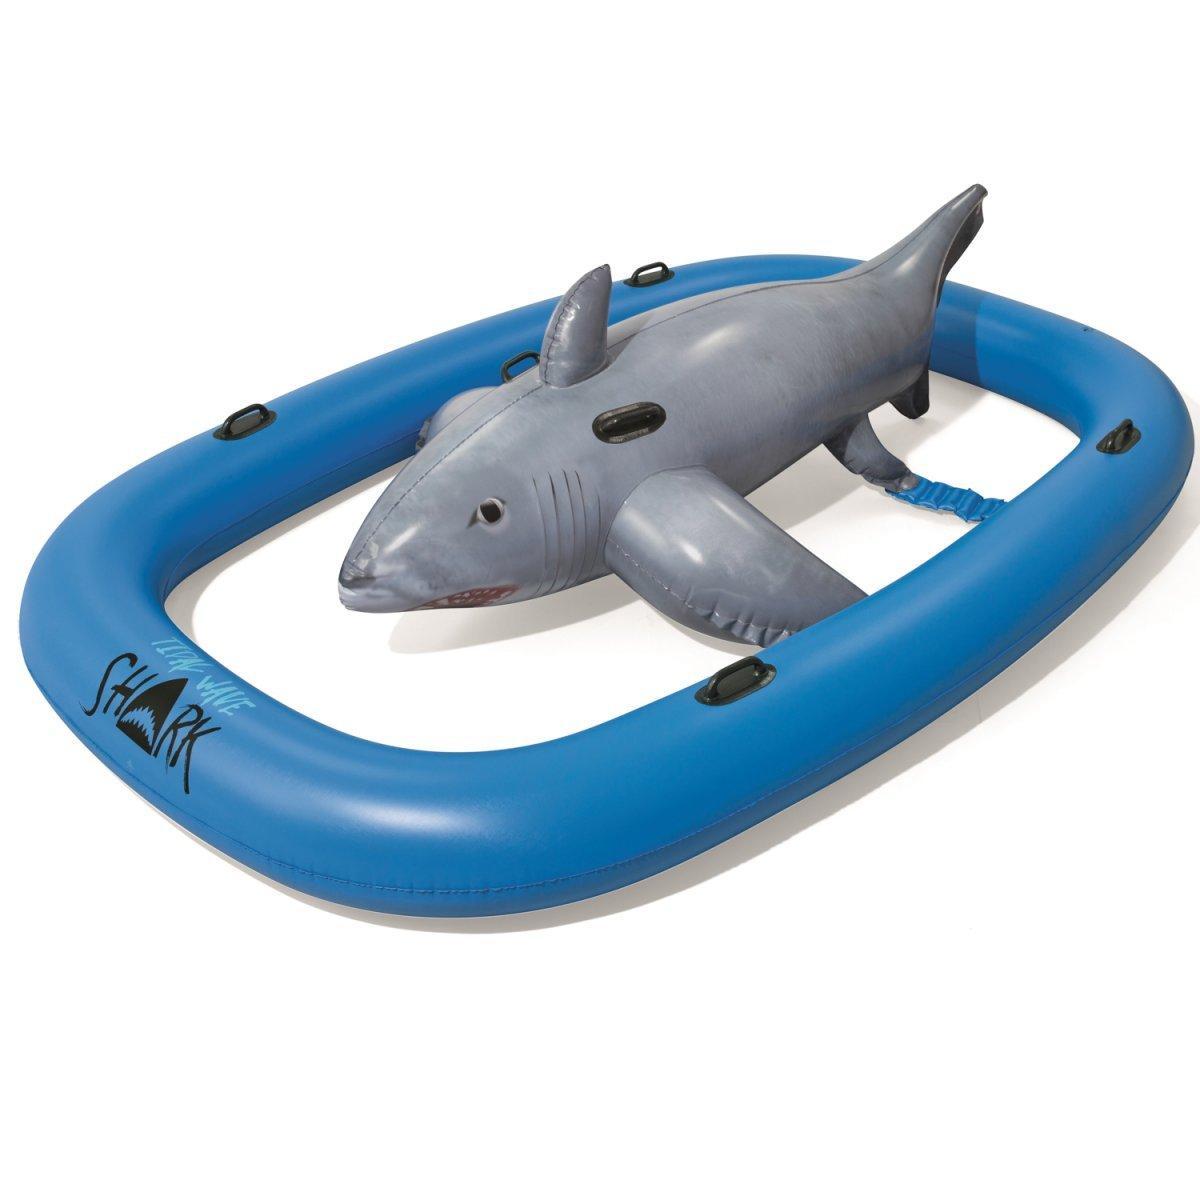 Надувная игра на воде Bestway 41124 Акула, 310 х 213 см